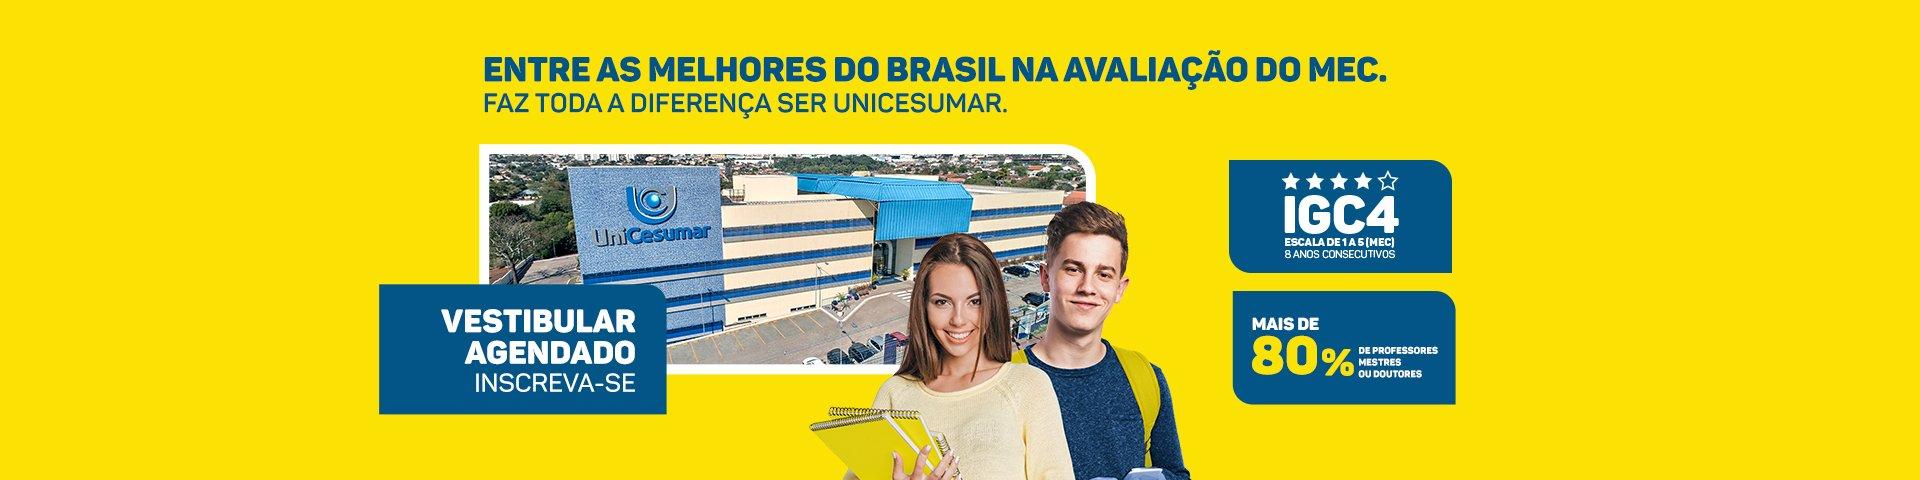 banner_home_agendado_1920x480px_londrina